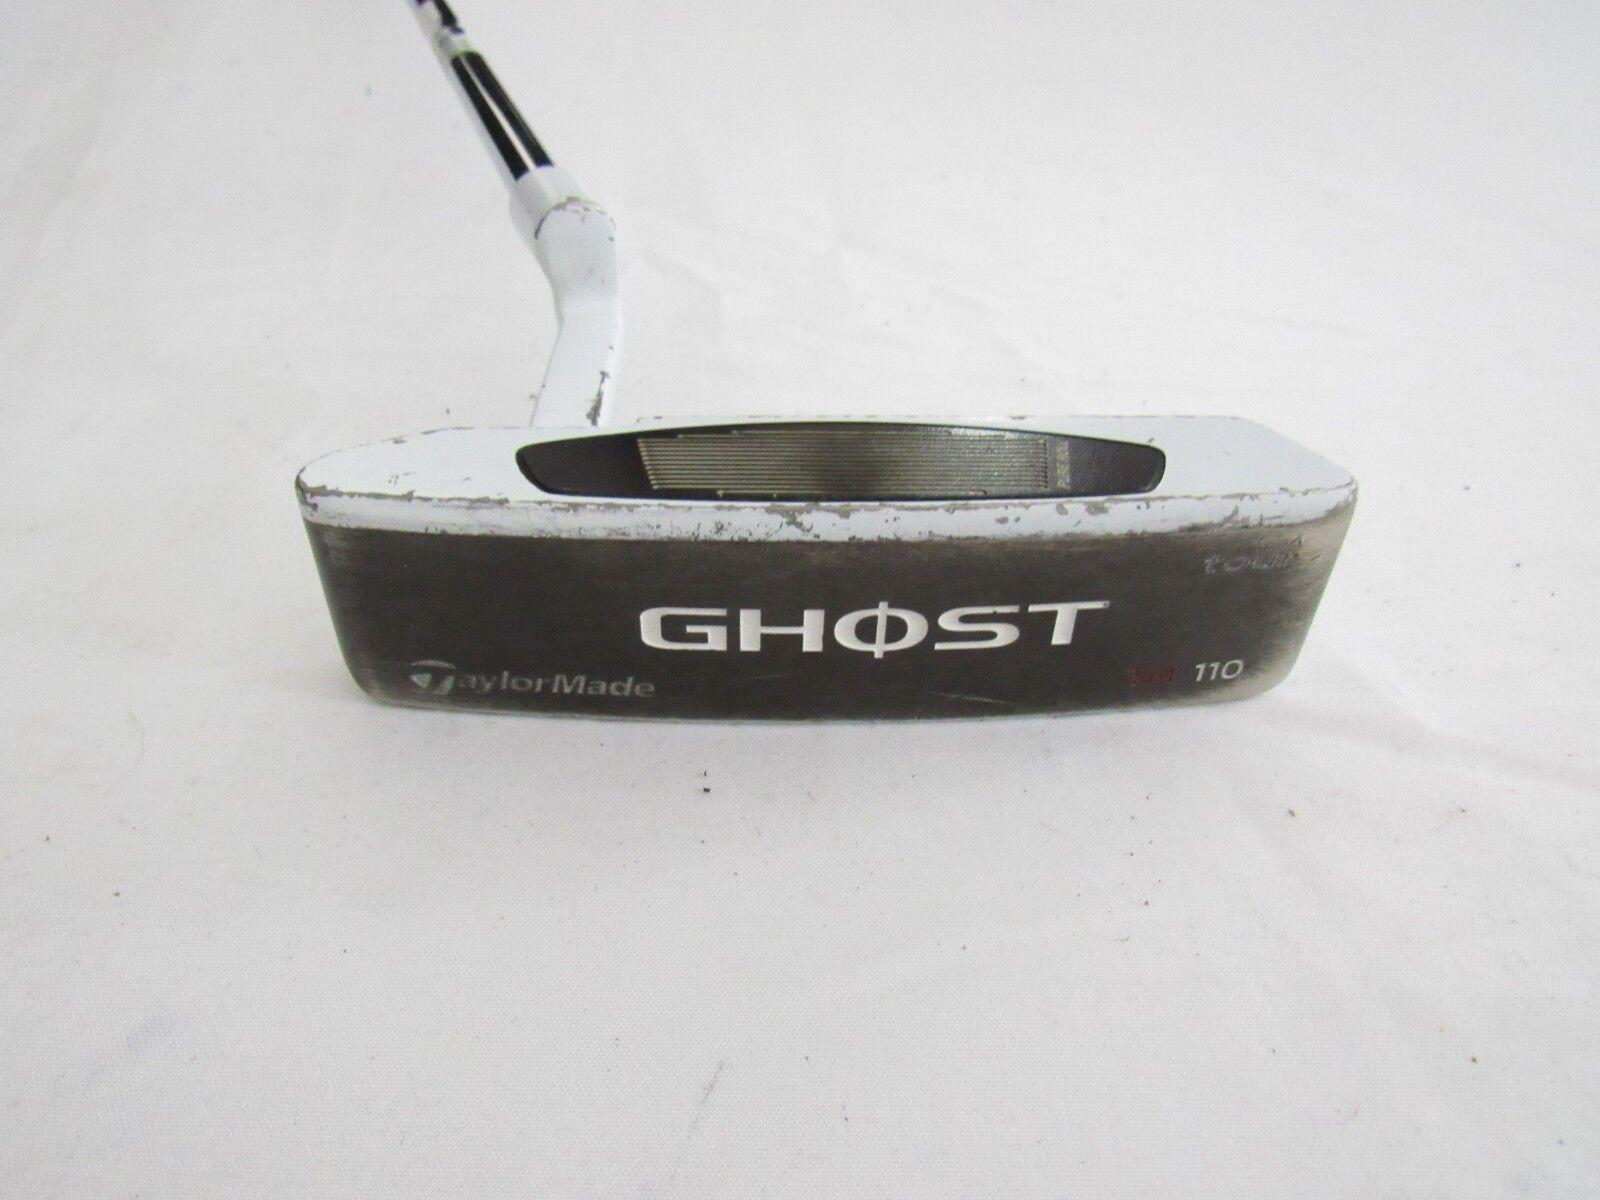 Taylormade Ghost TM-110 LH. Usada Tour 35  Putter  LH  n ° 1 en línea